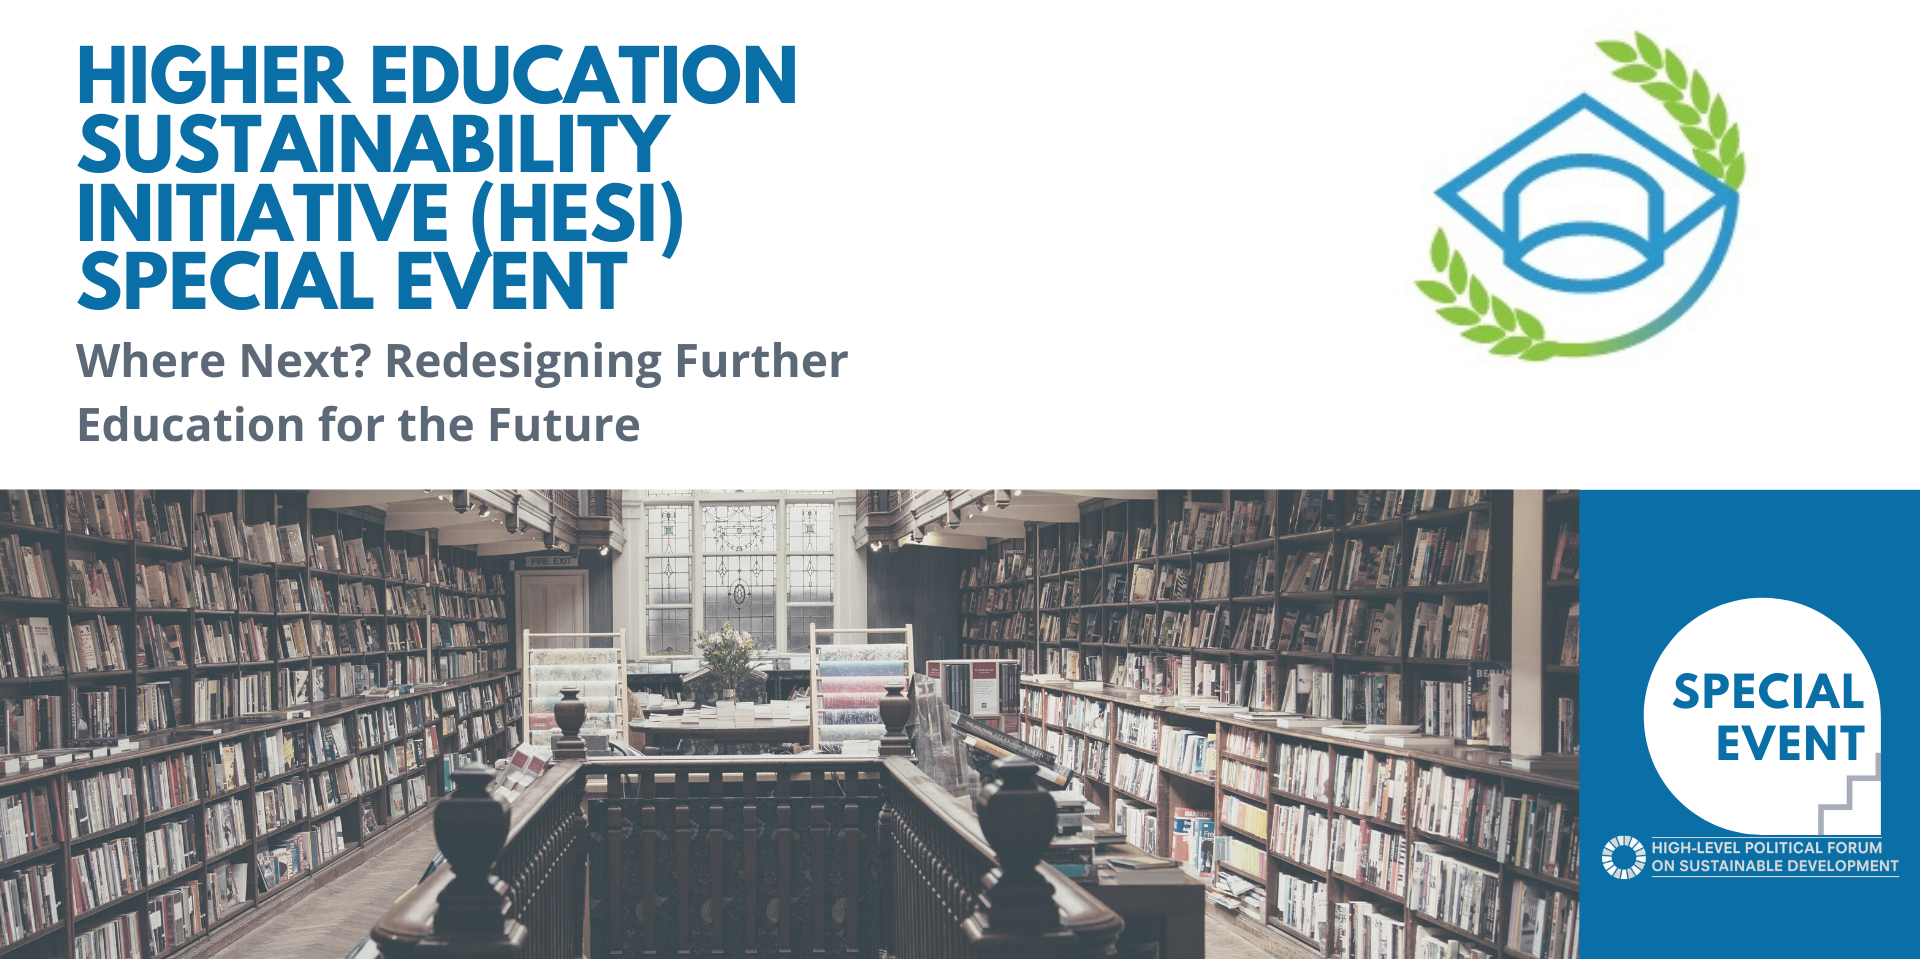 Higher Education Sustainability Initiative Sustainable Development Knowledge Platform